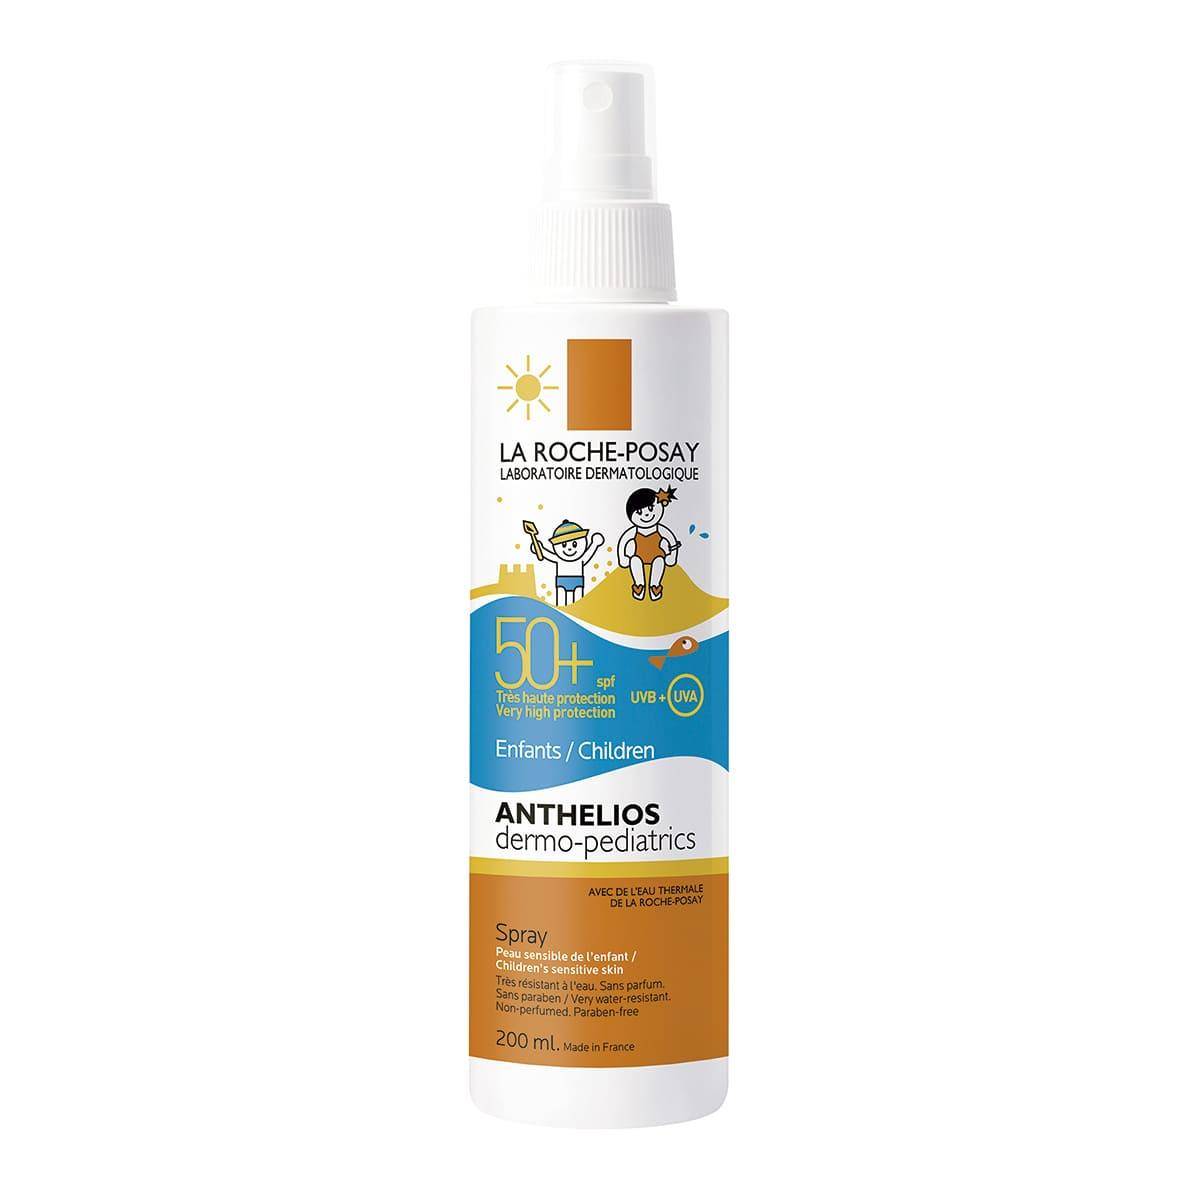 Anthelios Dermopediatrics Spray 200Ml